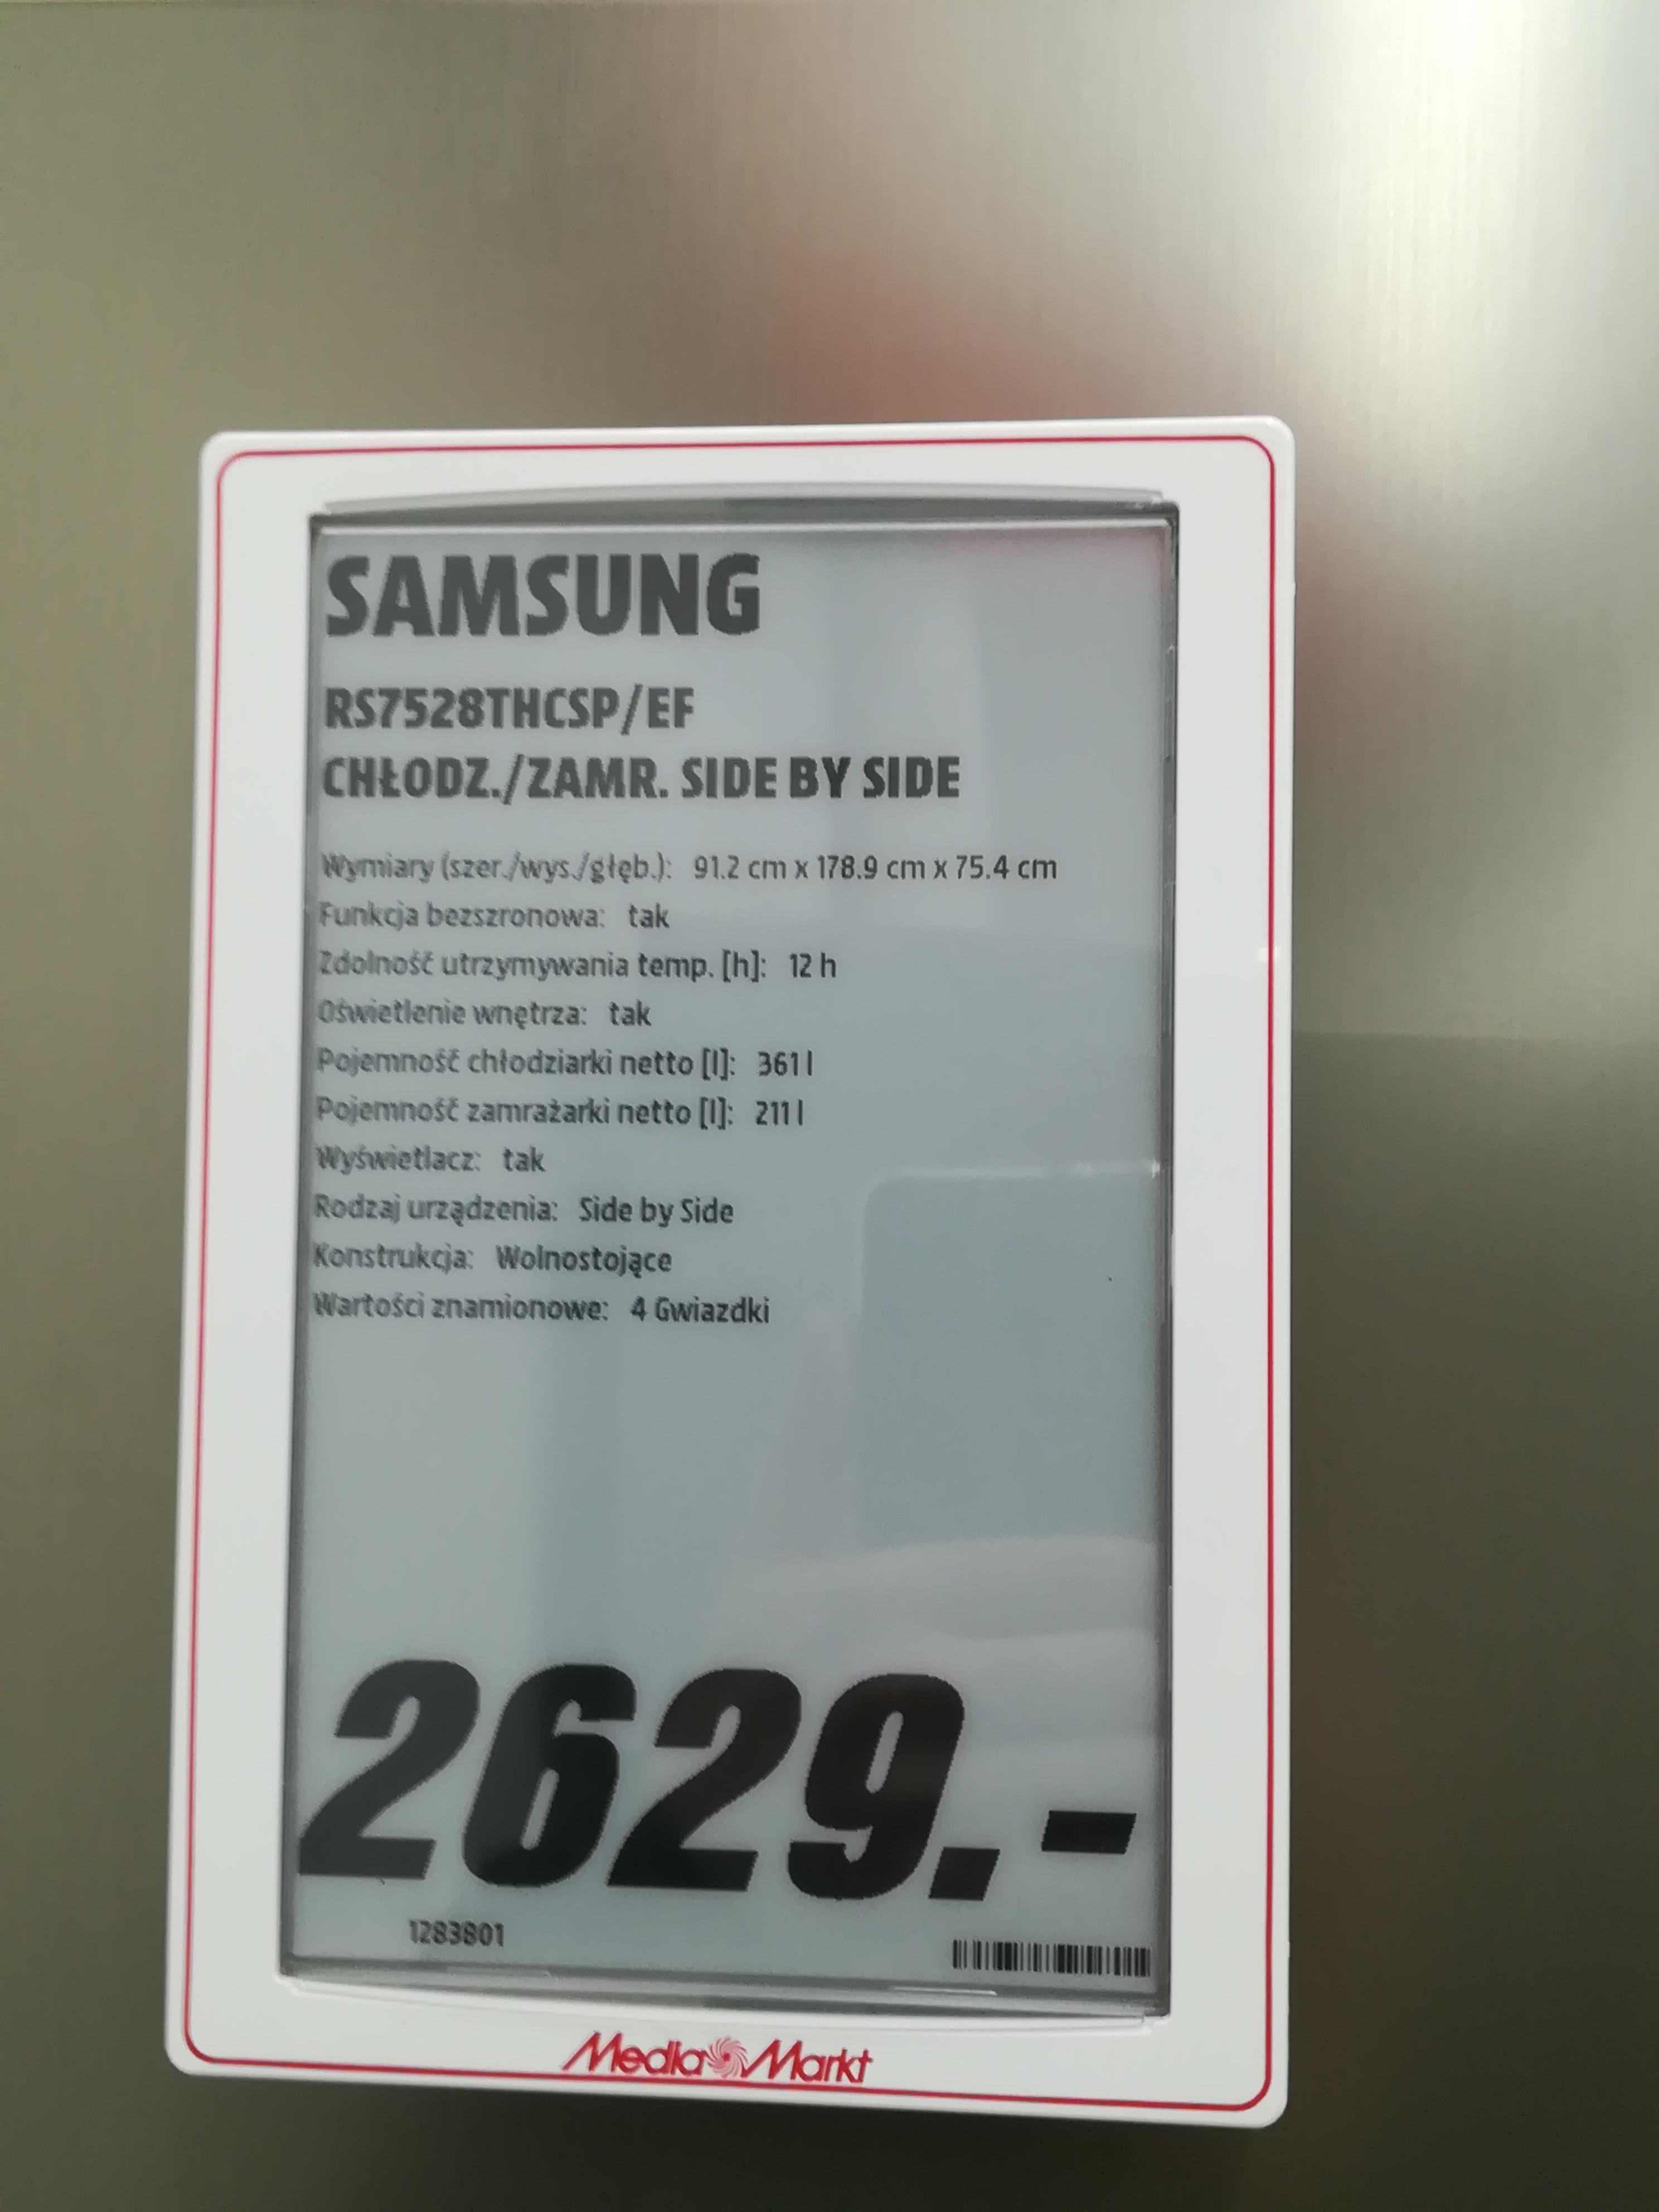 Lodówka side by side Samsung RS7528THCSP/EF  Katowice/Silesia/Media Markt